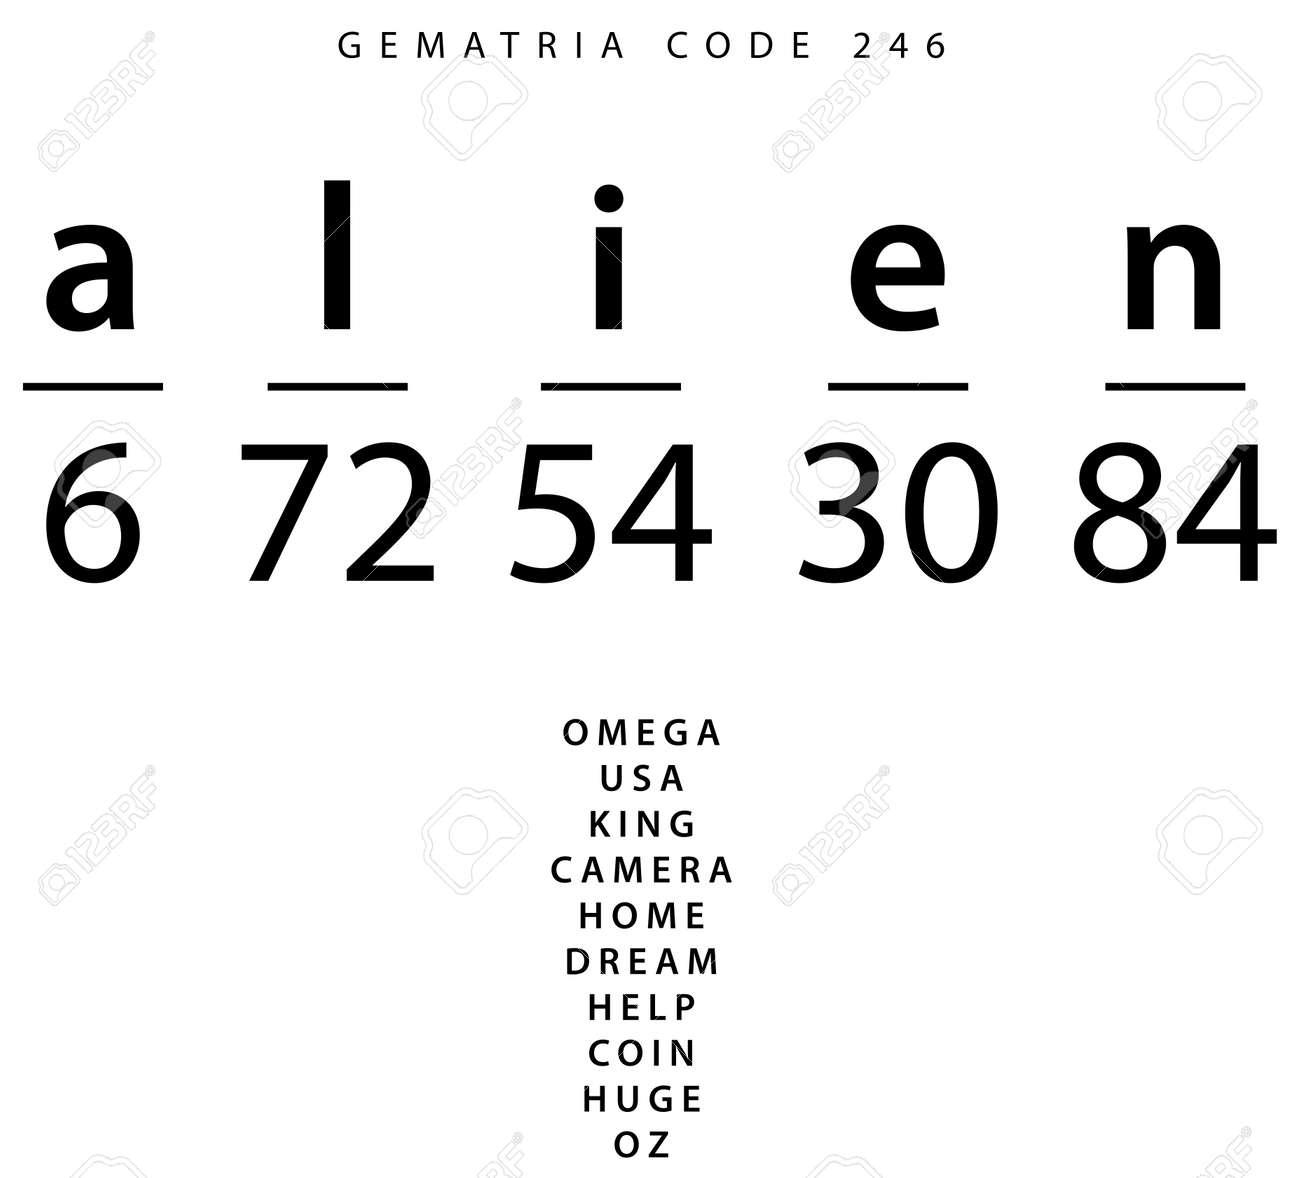 Alien word code in the English Gematria - 168027033